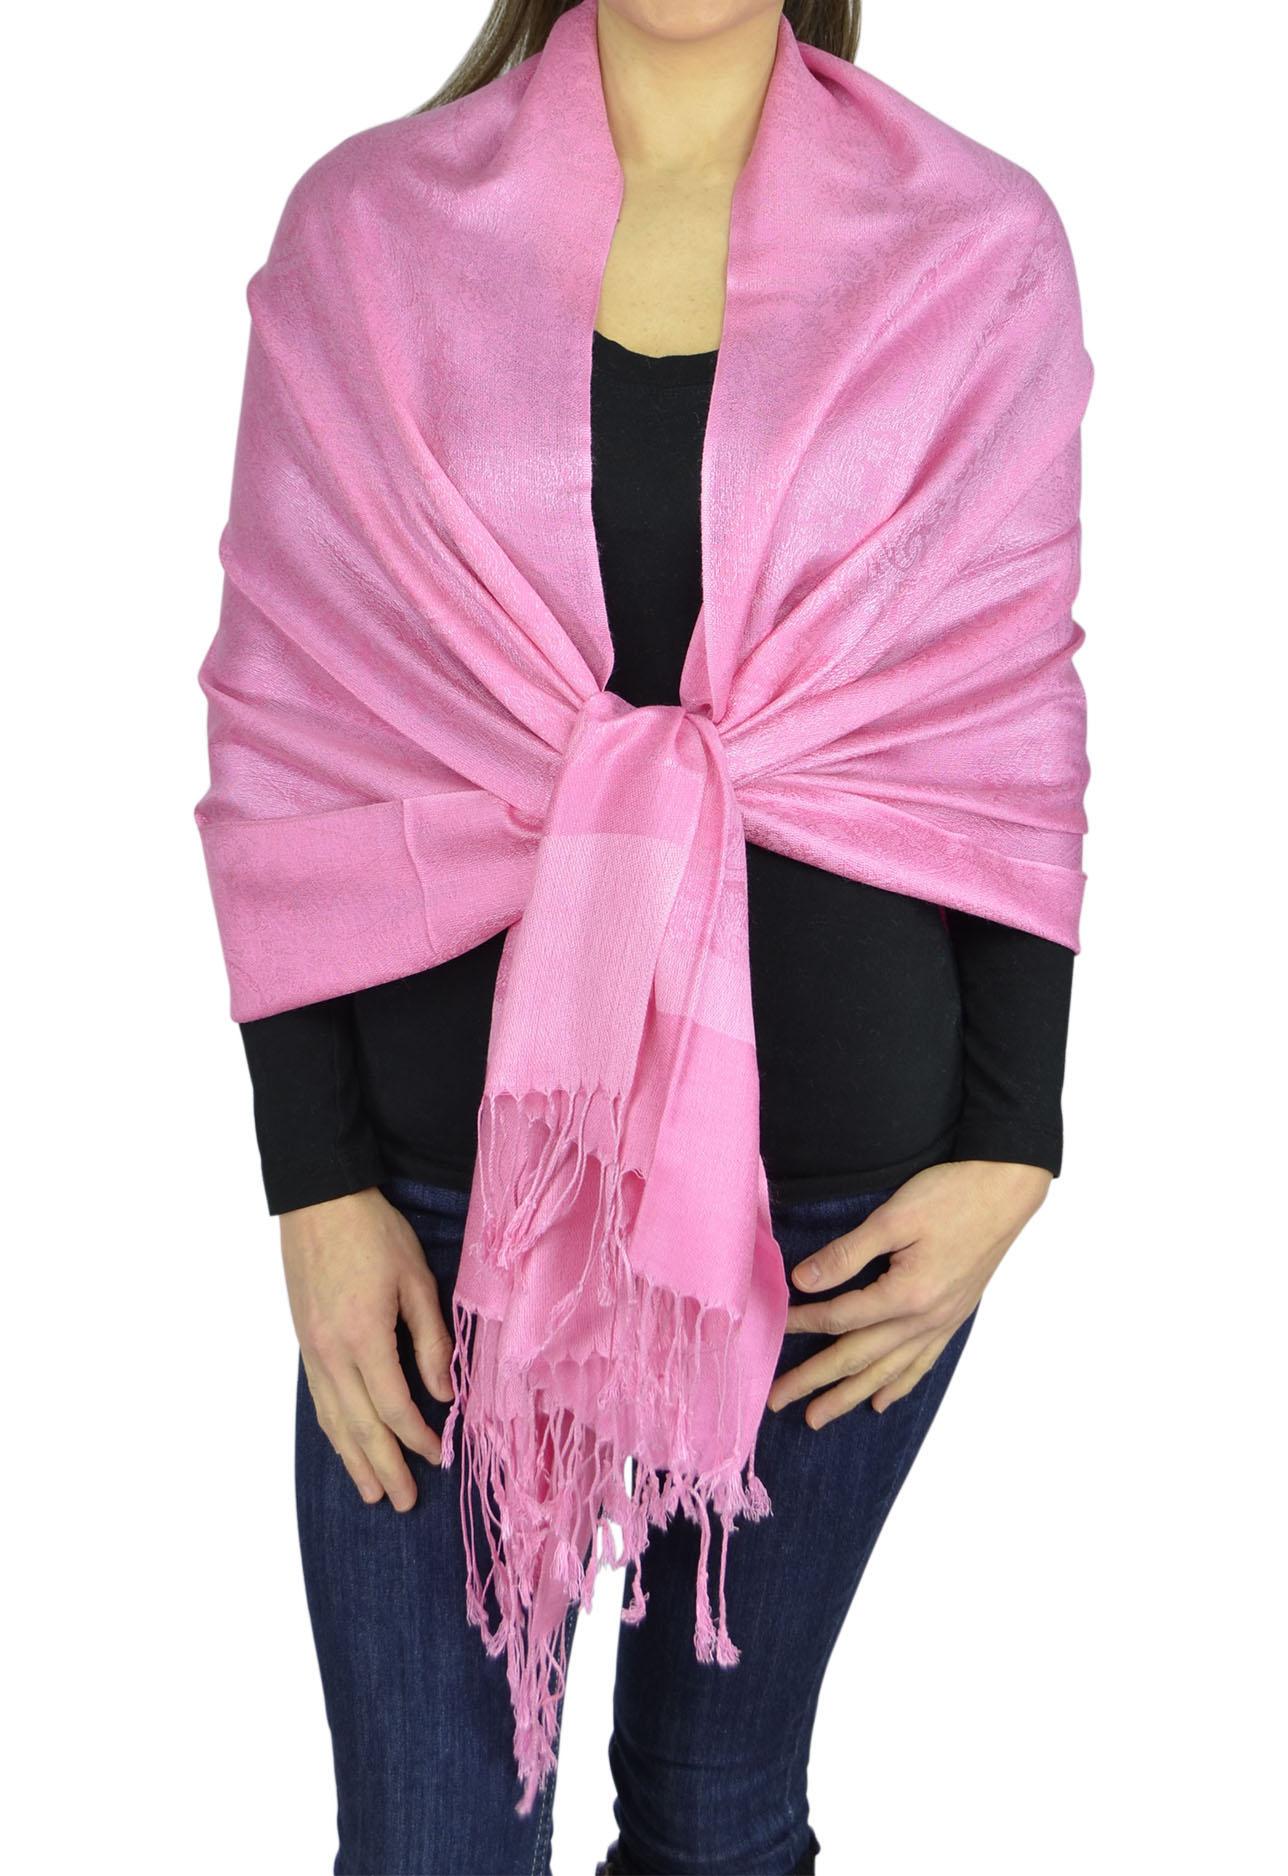 Belle Donne Jacquard Paisley Pashmina Soft Elegant Scarves Wrap Shawl Stole - Bright Pink